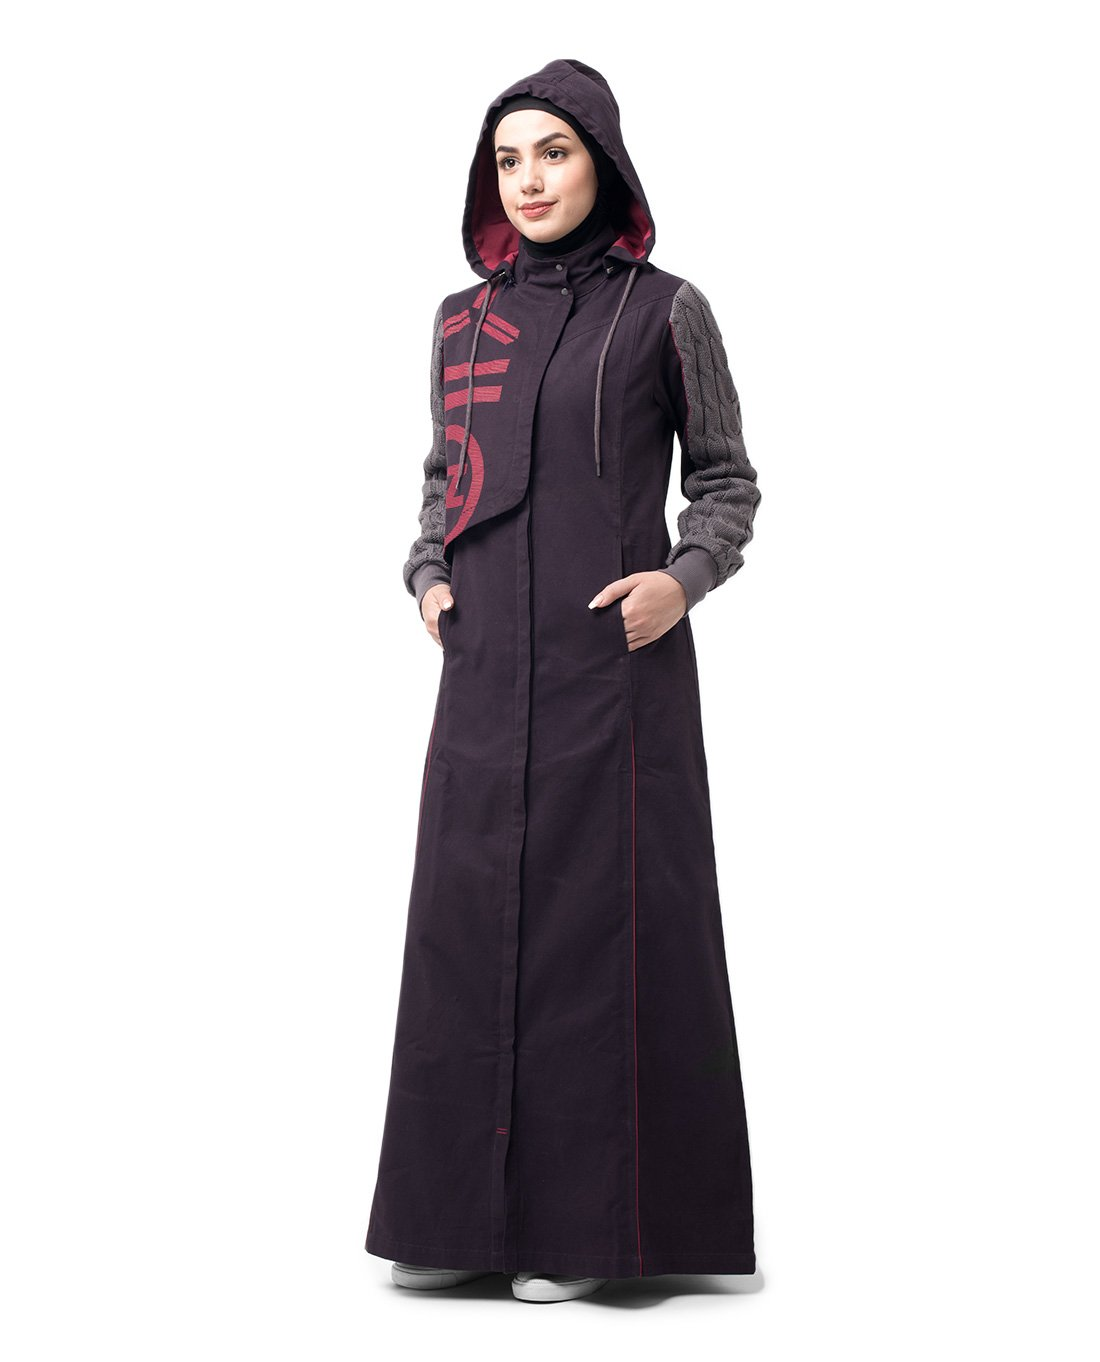 Silk Route Burgundy Red Winter Knit Printed Cotton Sporty Maxi Dress Jilbab XXLarge 60